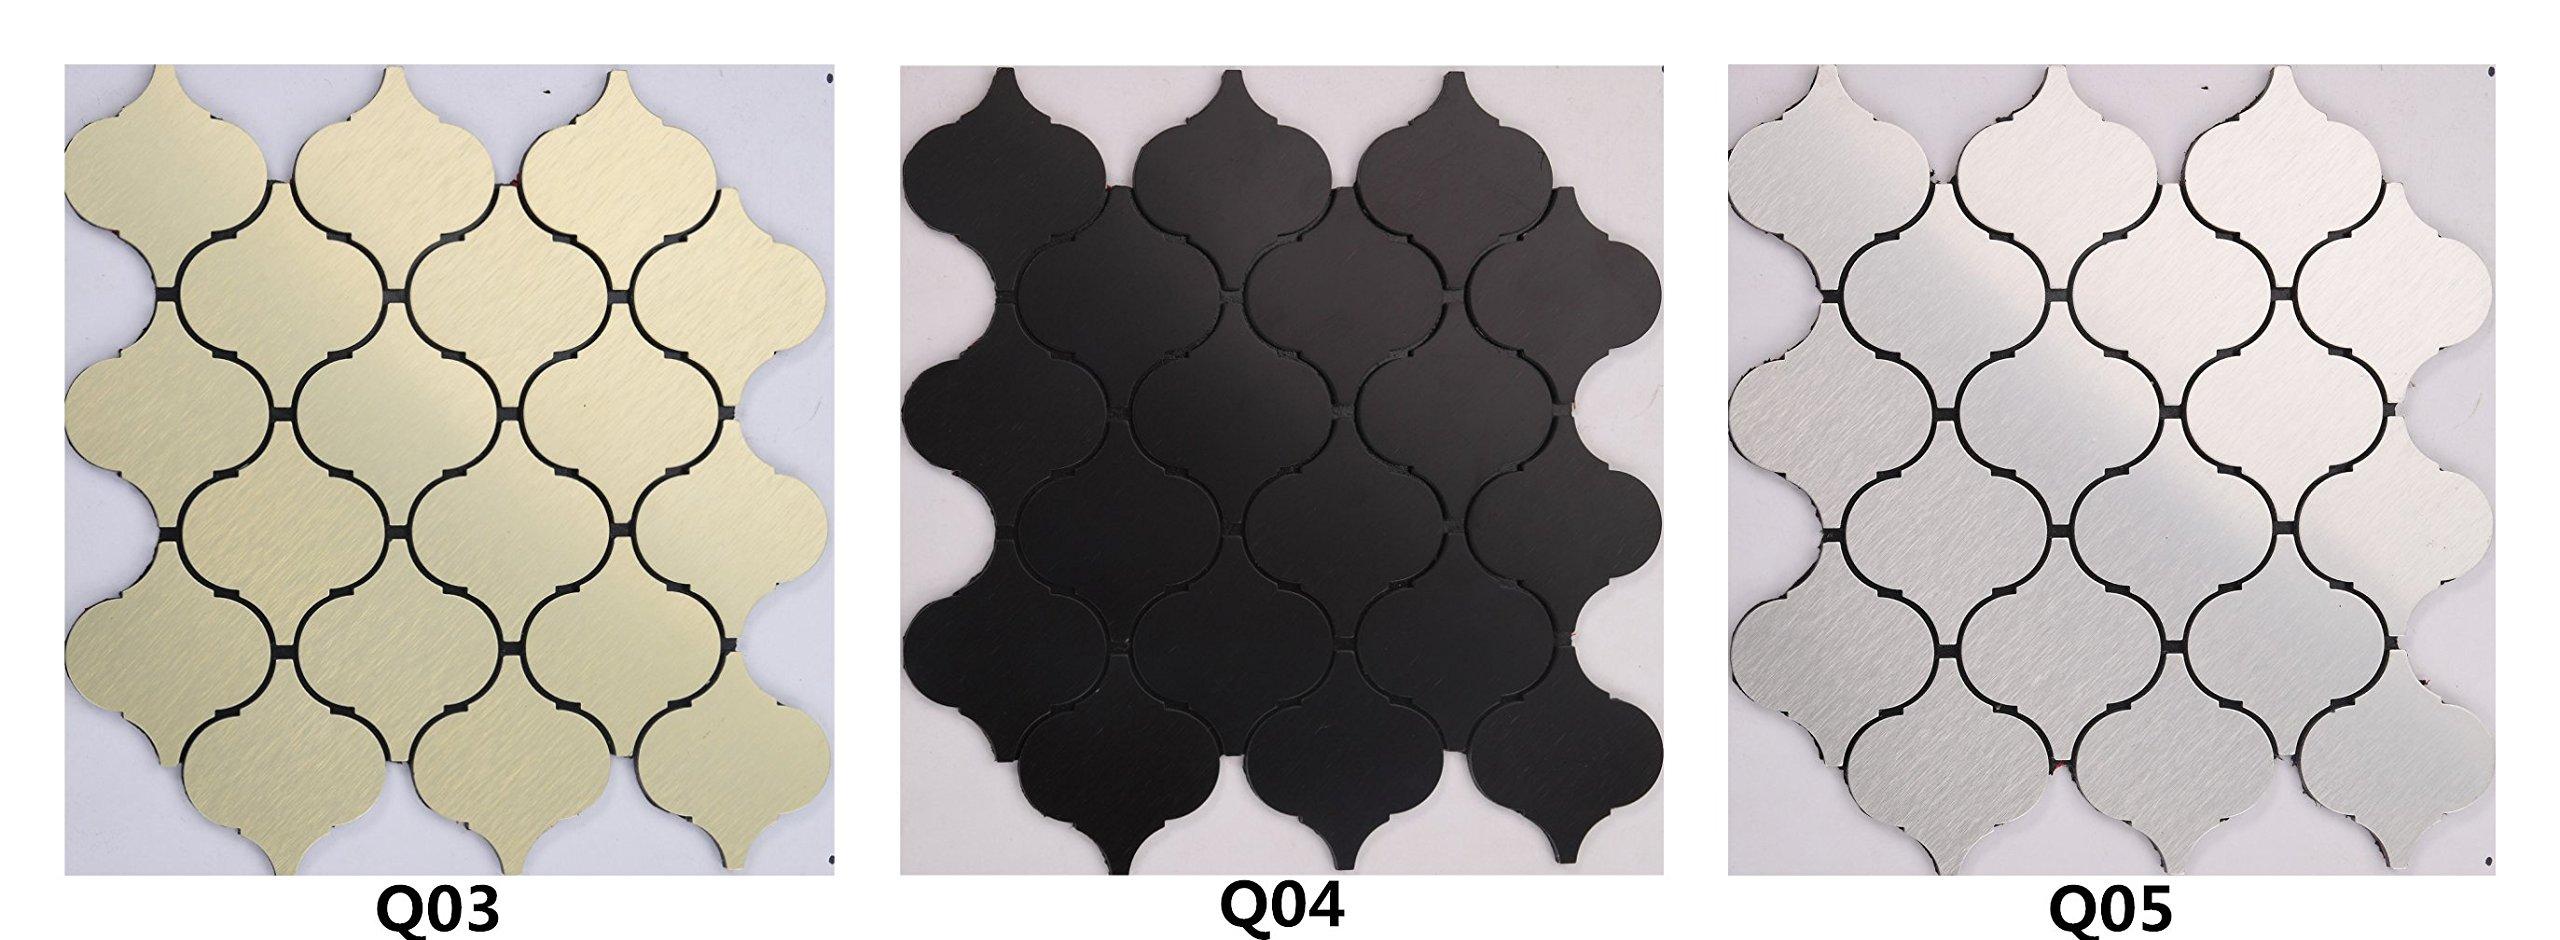 Peel and Stick Metal Backsplashes, Brushed Black Aluminum Self-adhesive wallpaper- Q04 (5PCS 5.38Sq.ft)